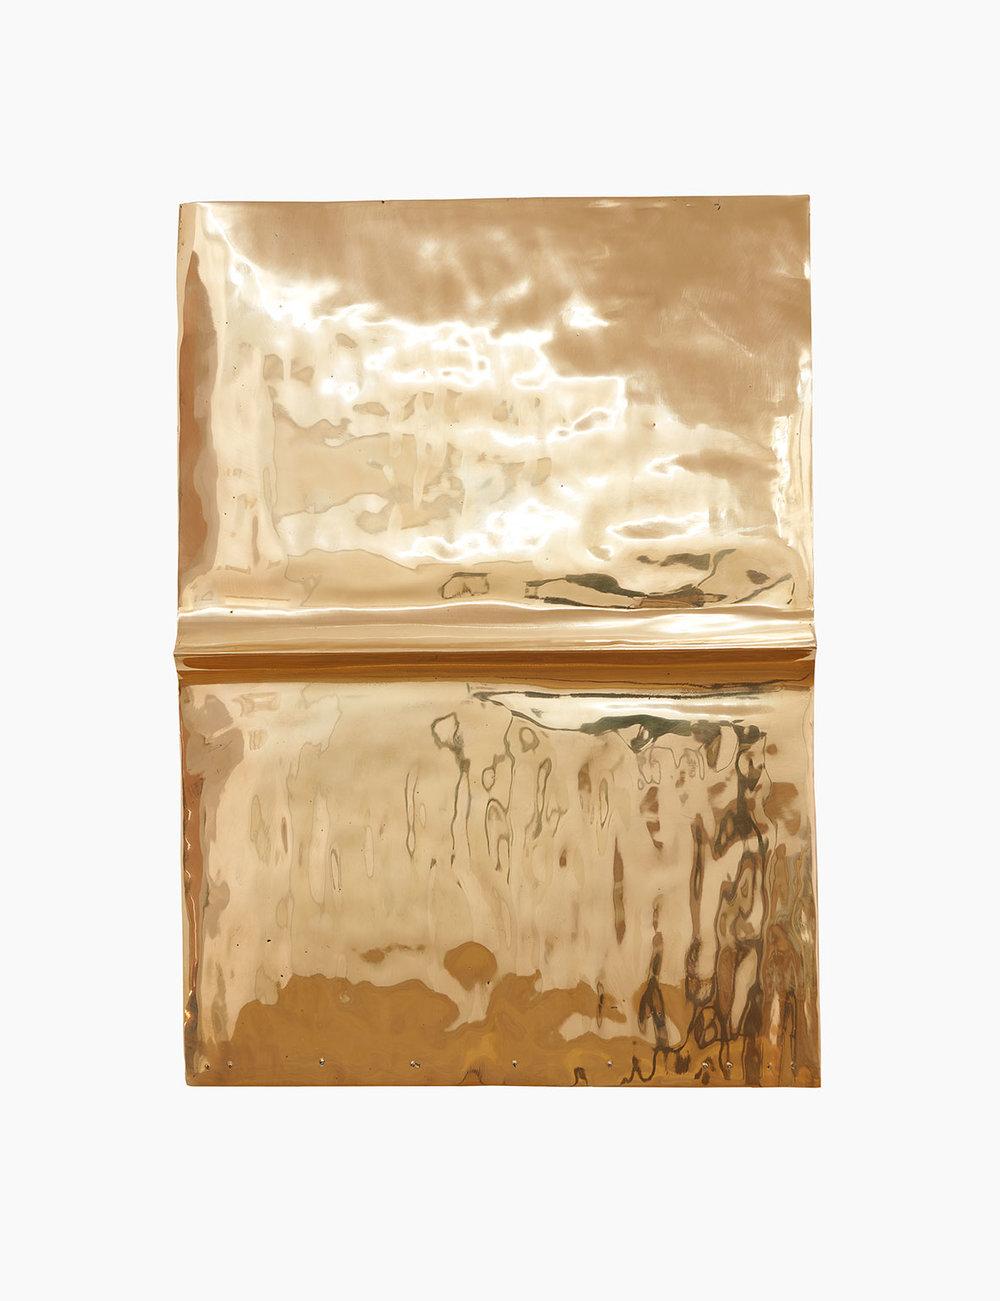 Mike Meiré ELEMENT 79, (ETERNAL NEWS SERIES) 2016  Bronze 48 x 34,5 x 2 cm